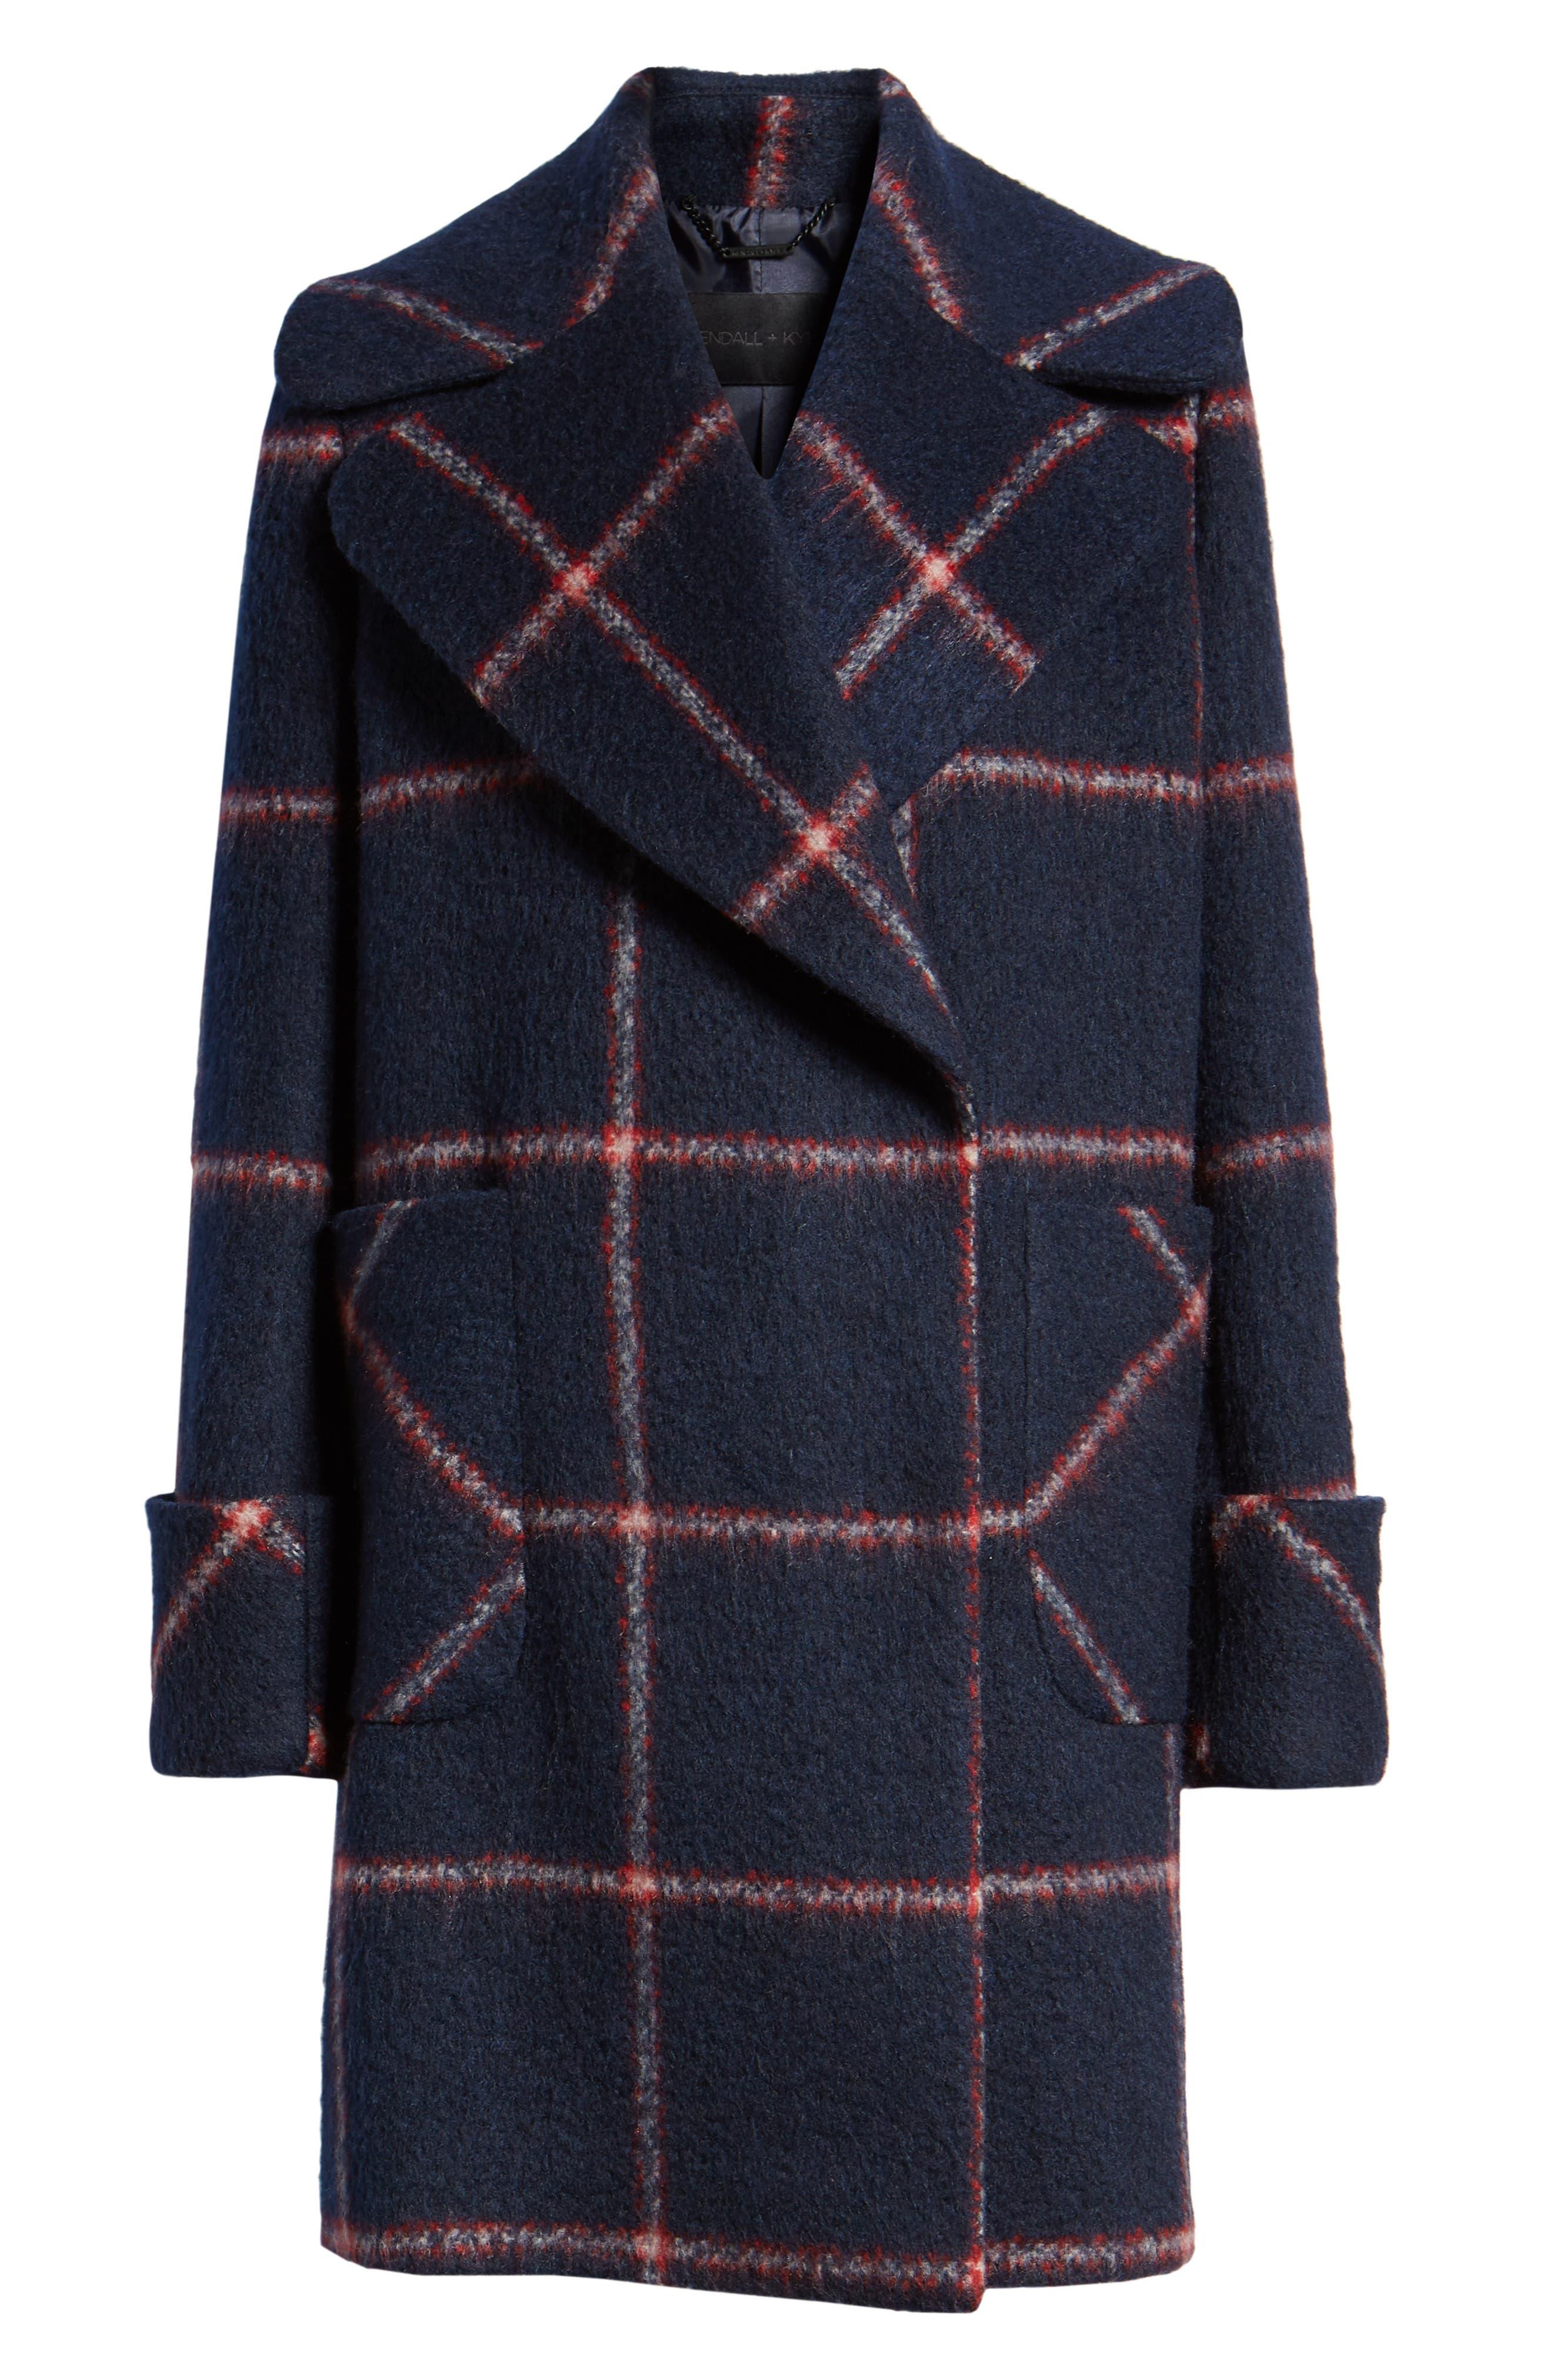 KENDALL + KYLIE, Oversize Collar Coat, Alternate thumbnail 5, color, 427